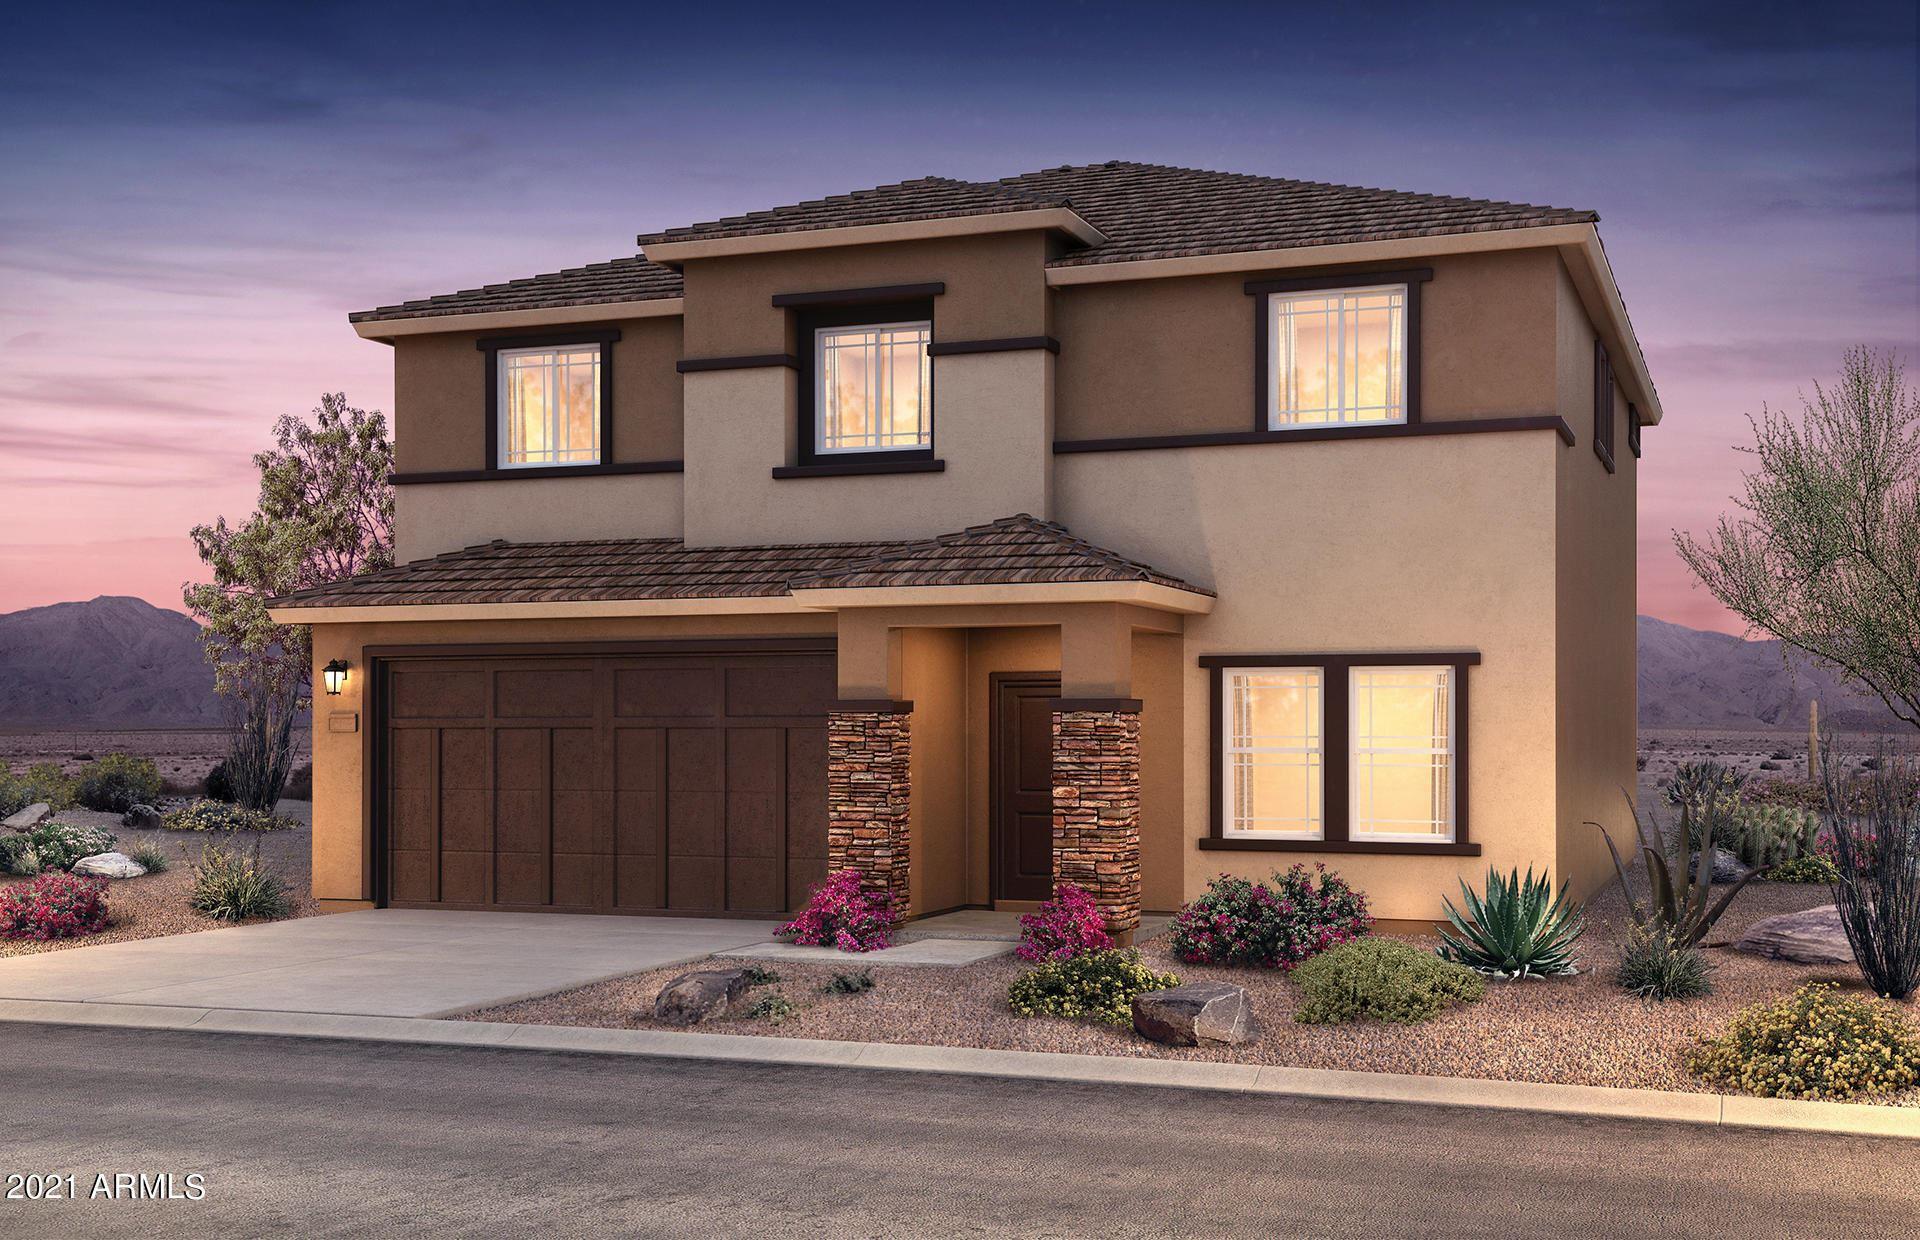 Photo for 43800 W MESCAL Street, Maricopa, AZ 85138 (MLS # 6266873)